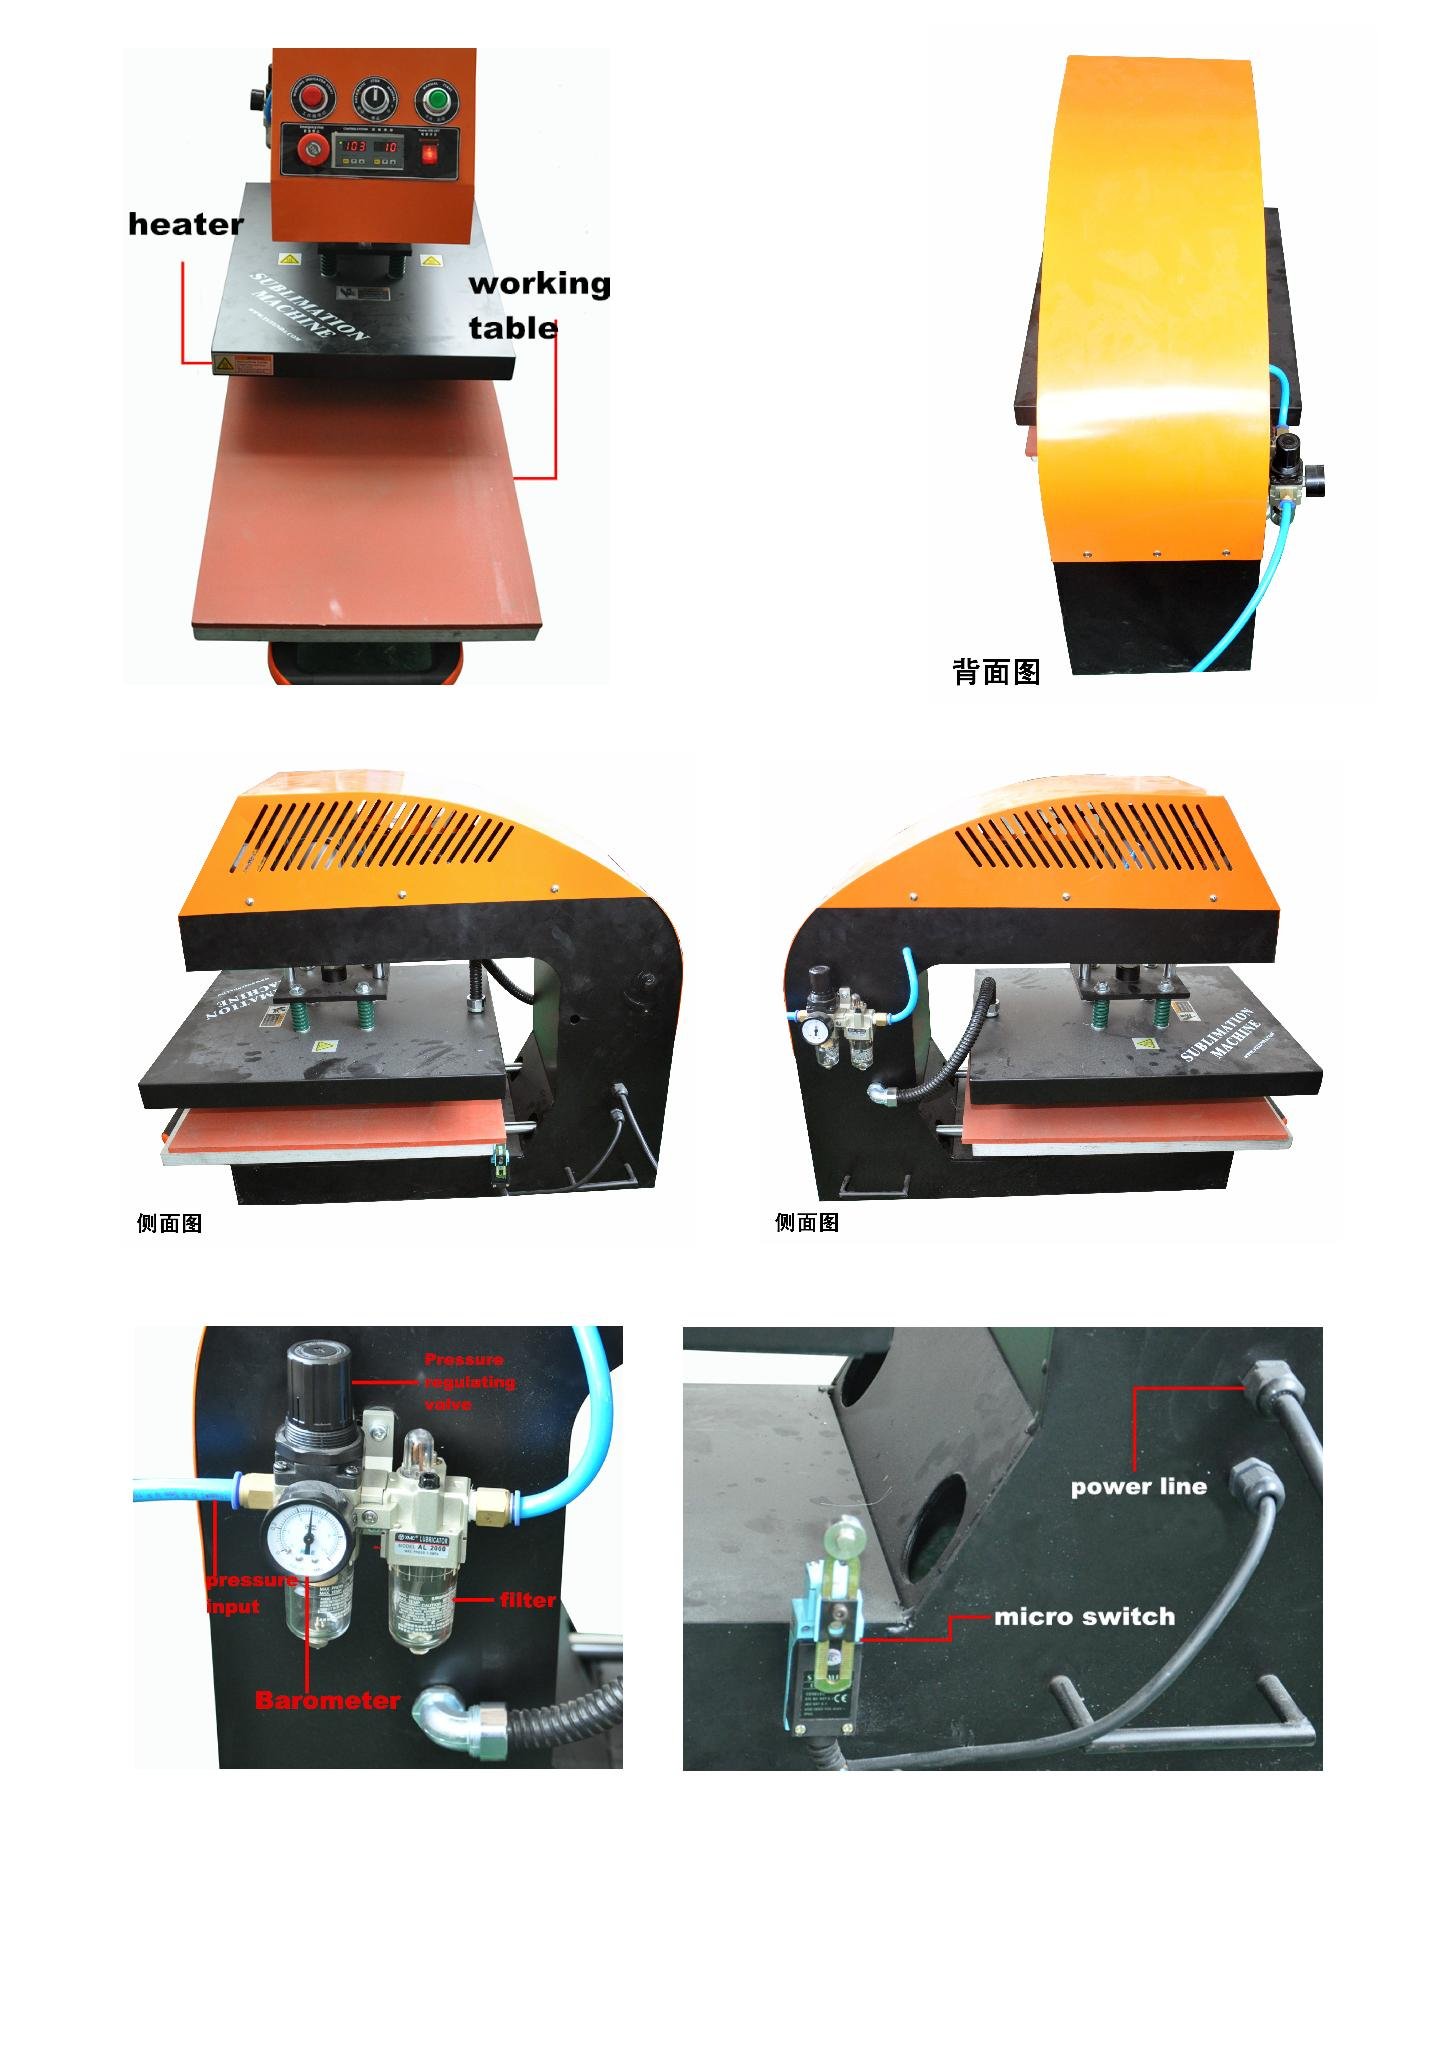 60*80cm YXD-A8 air operated single station heat press machine  14